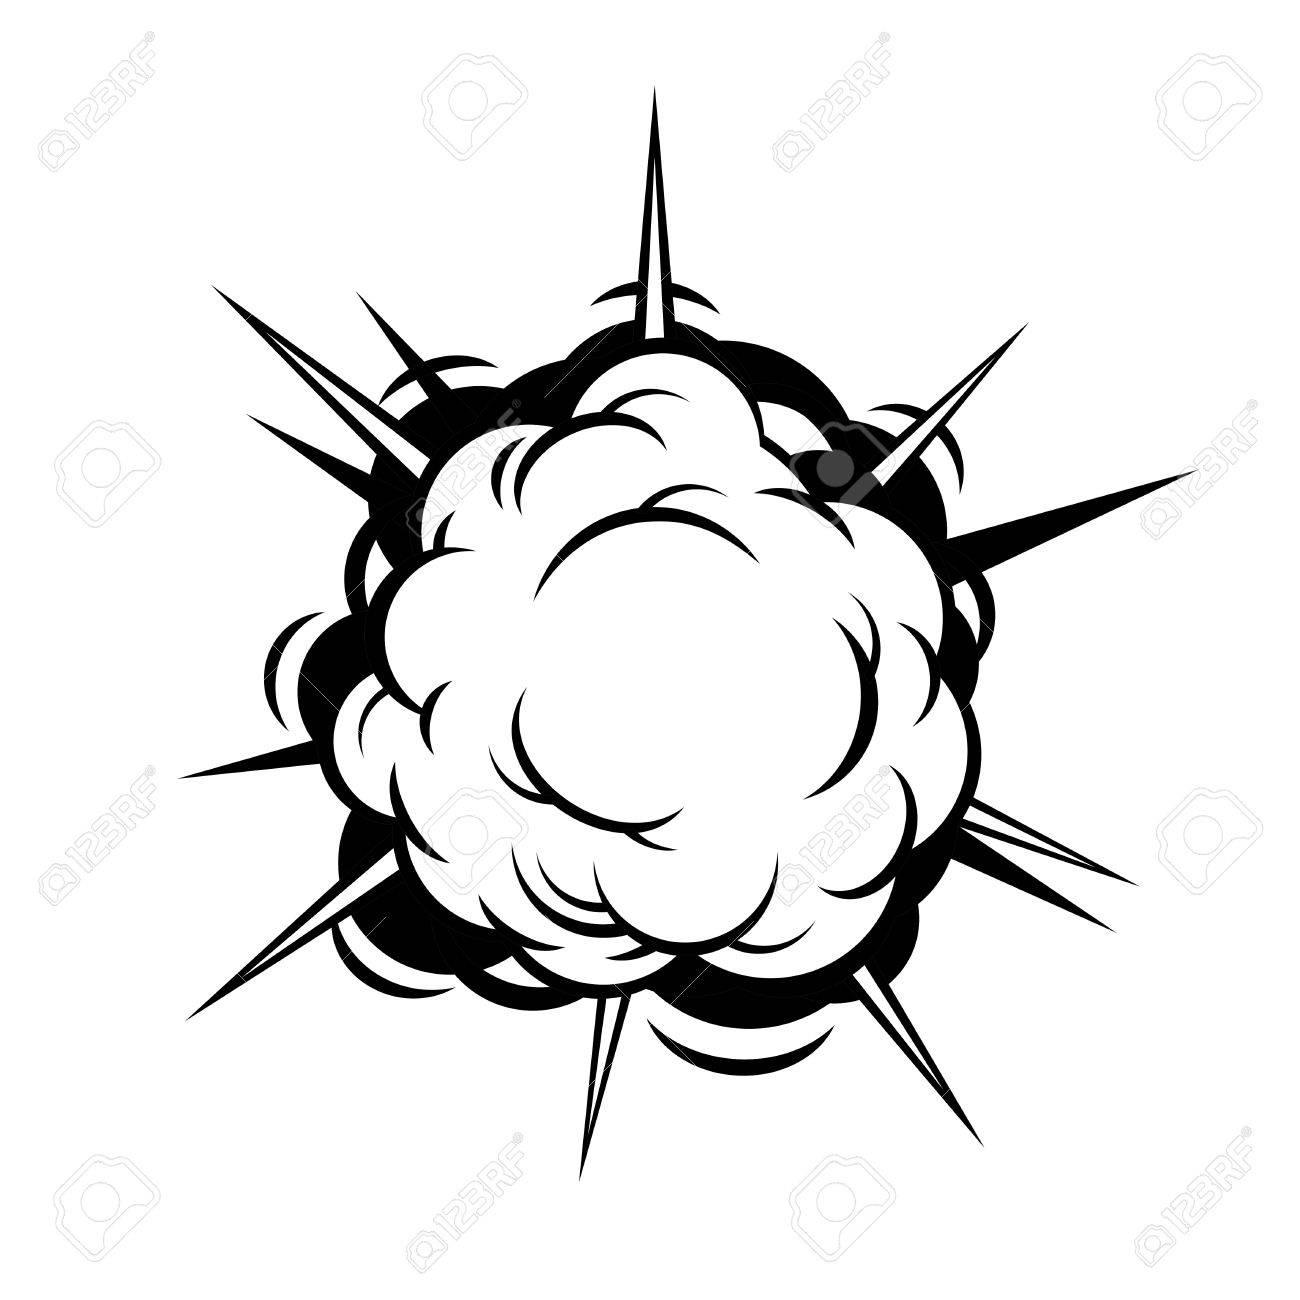 Comic Boom. Black Explosion on White Background. Vector illustration.